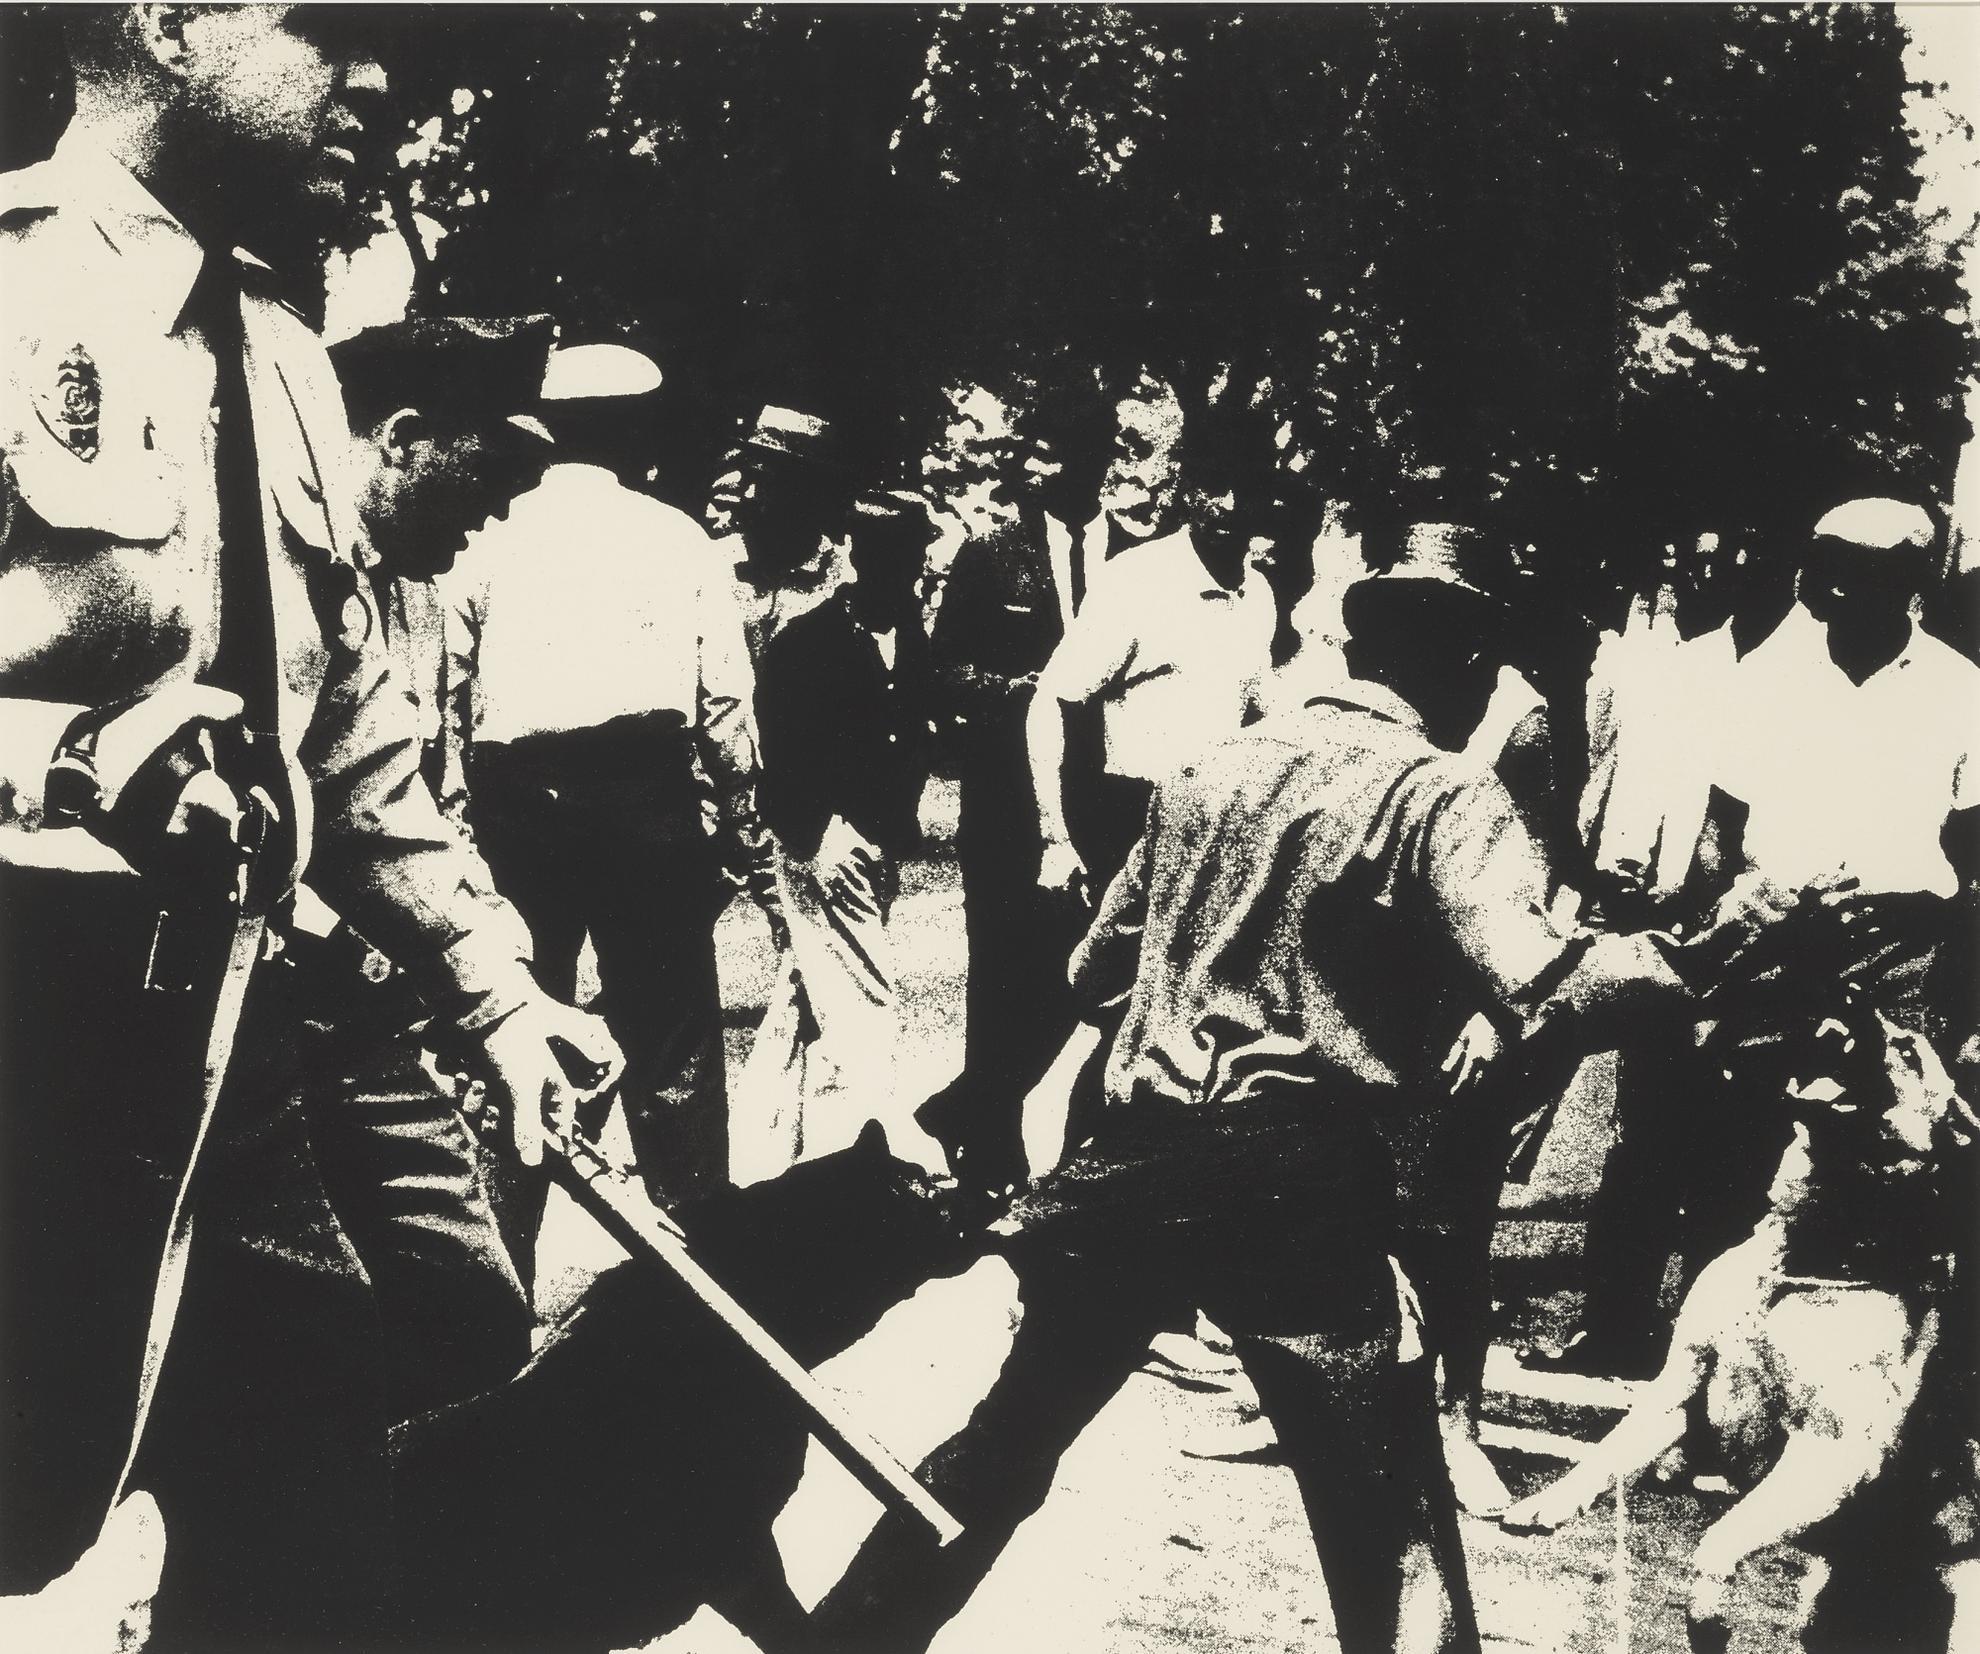 Andy Warhol-Birmingham Race Riot (F. & S. II.3)-1964